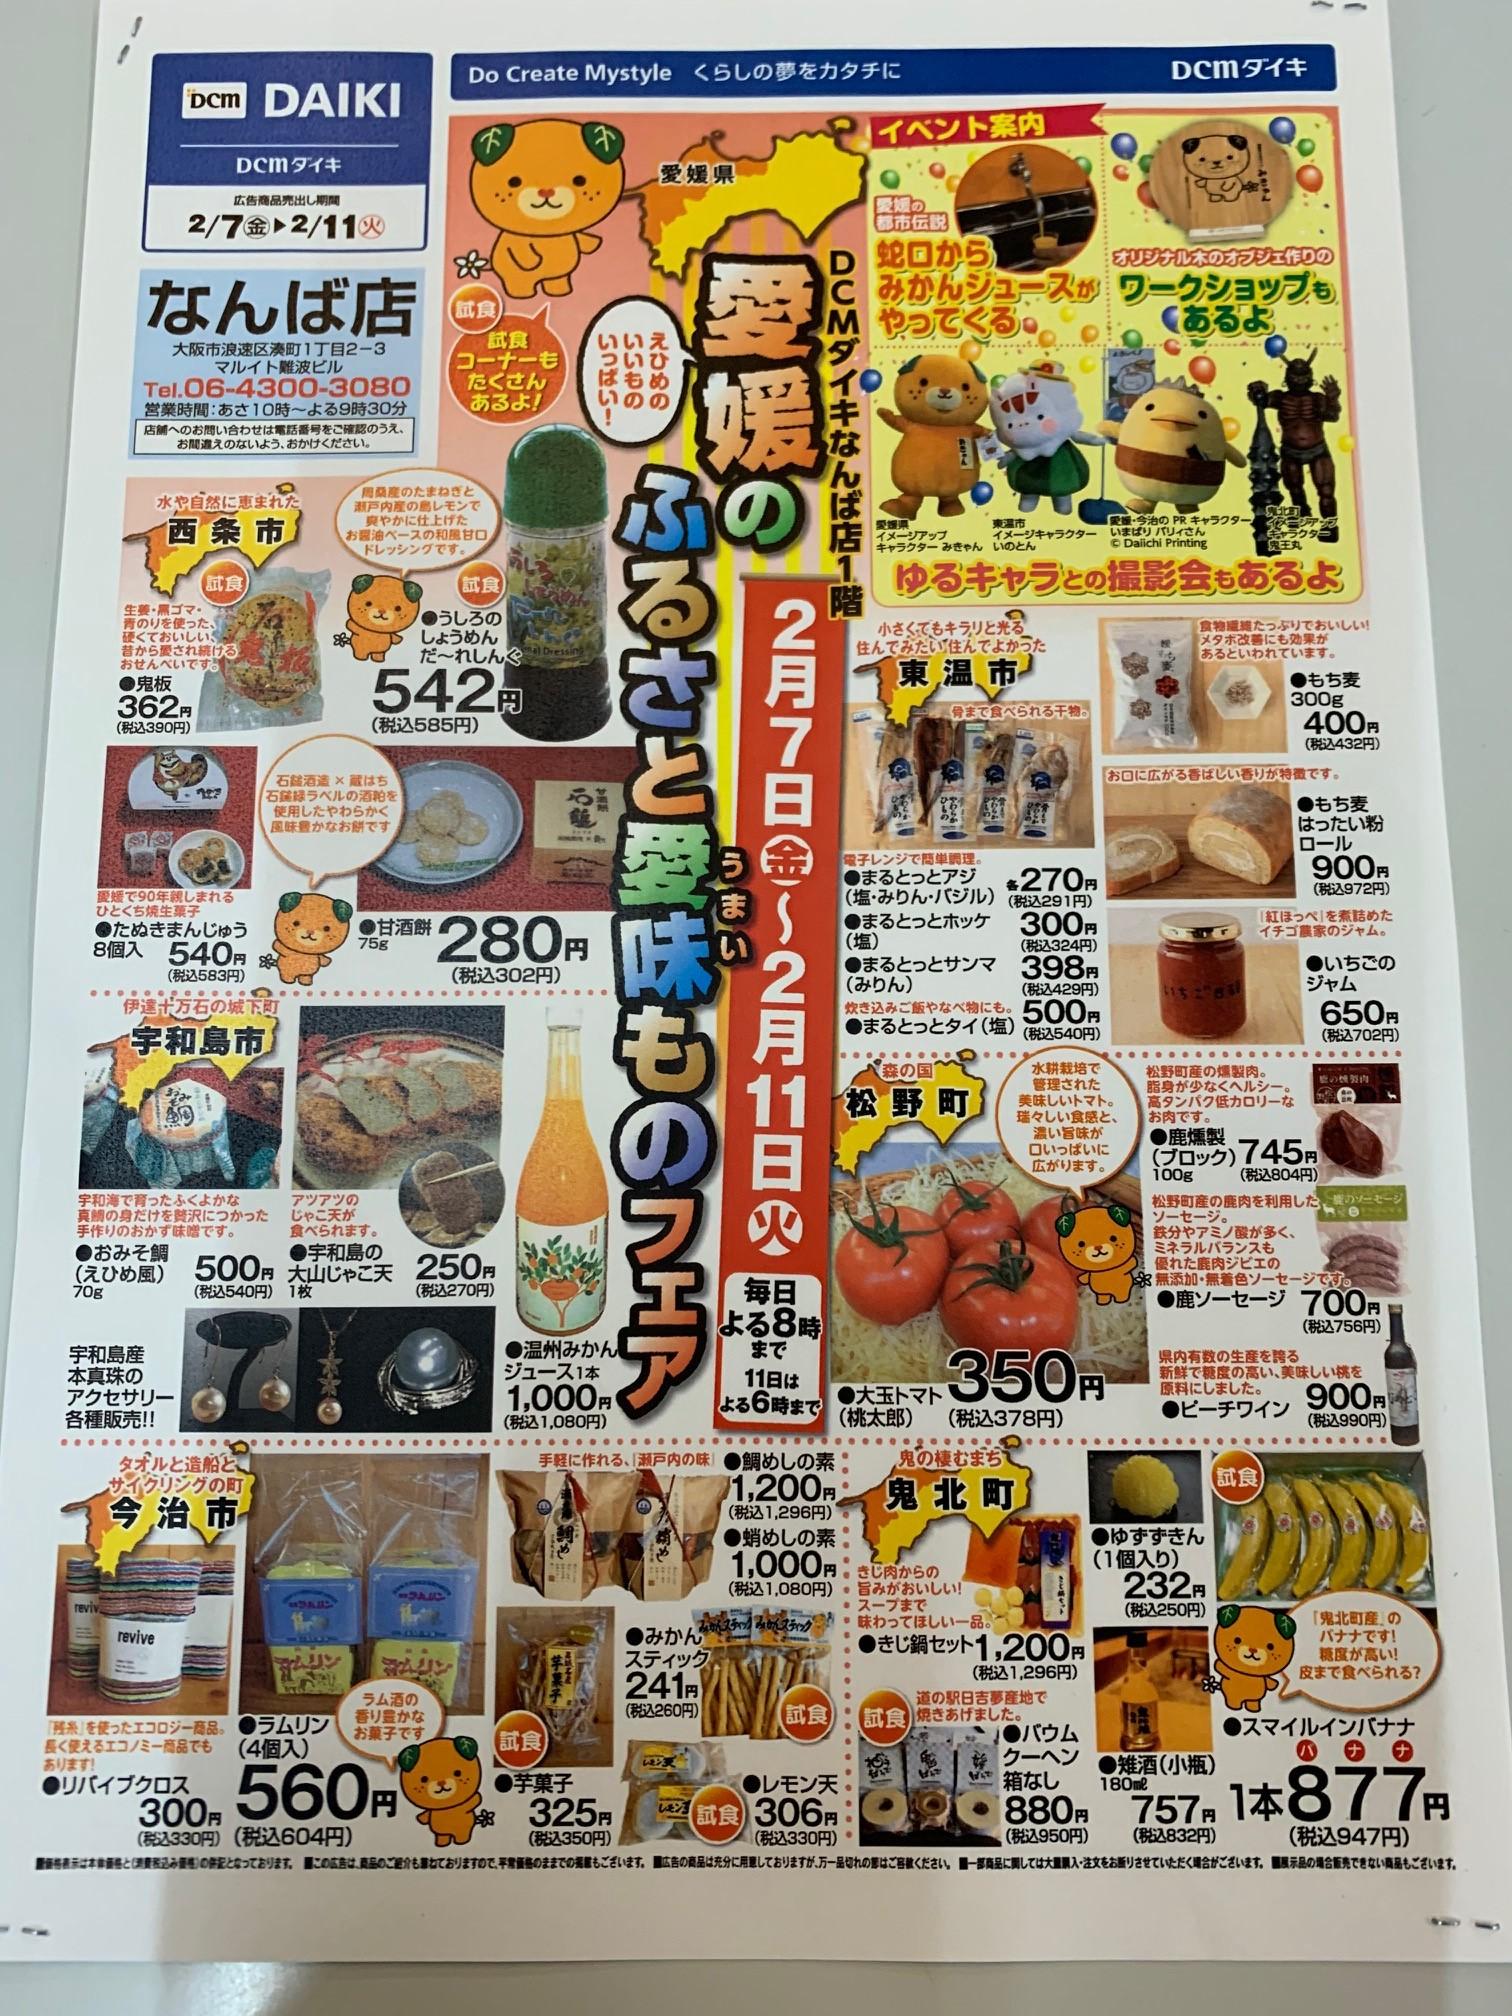 DCMダイキなんば店『愛媛のふるさと愛味ものフェア』 西条物産販売!